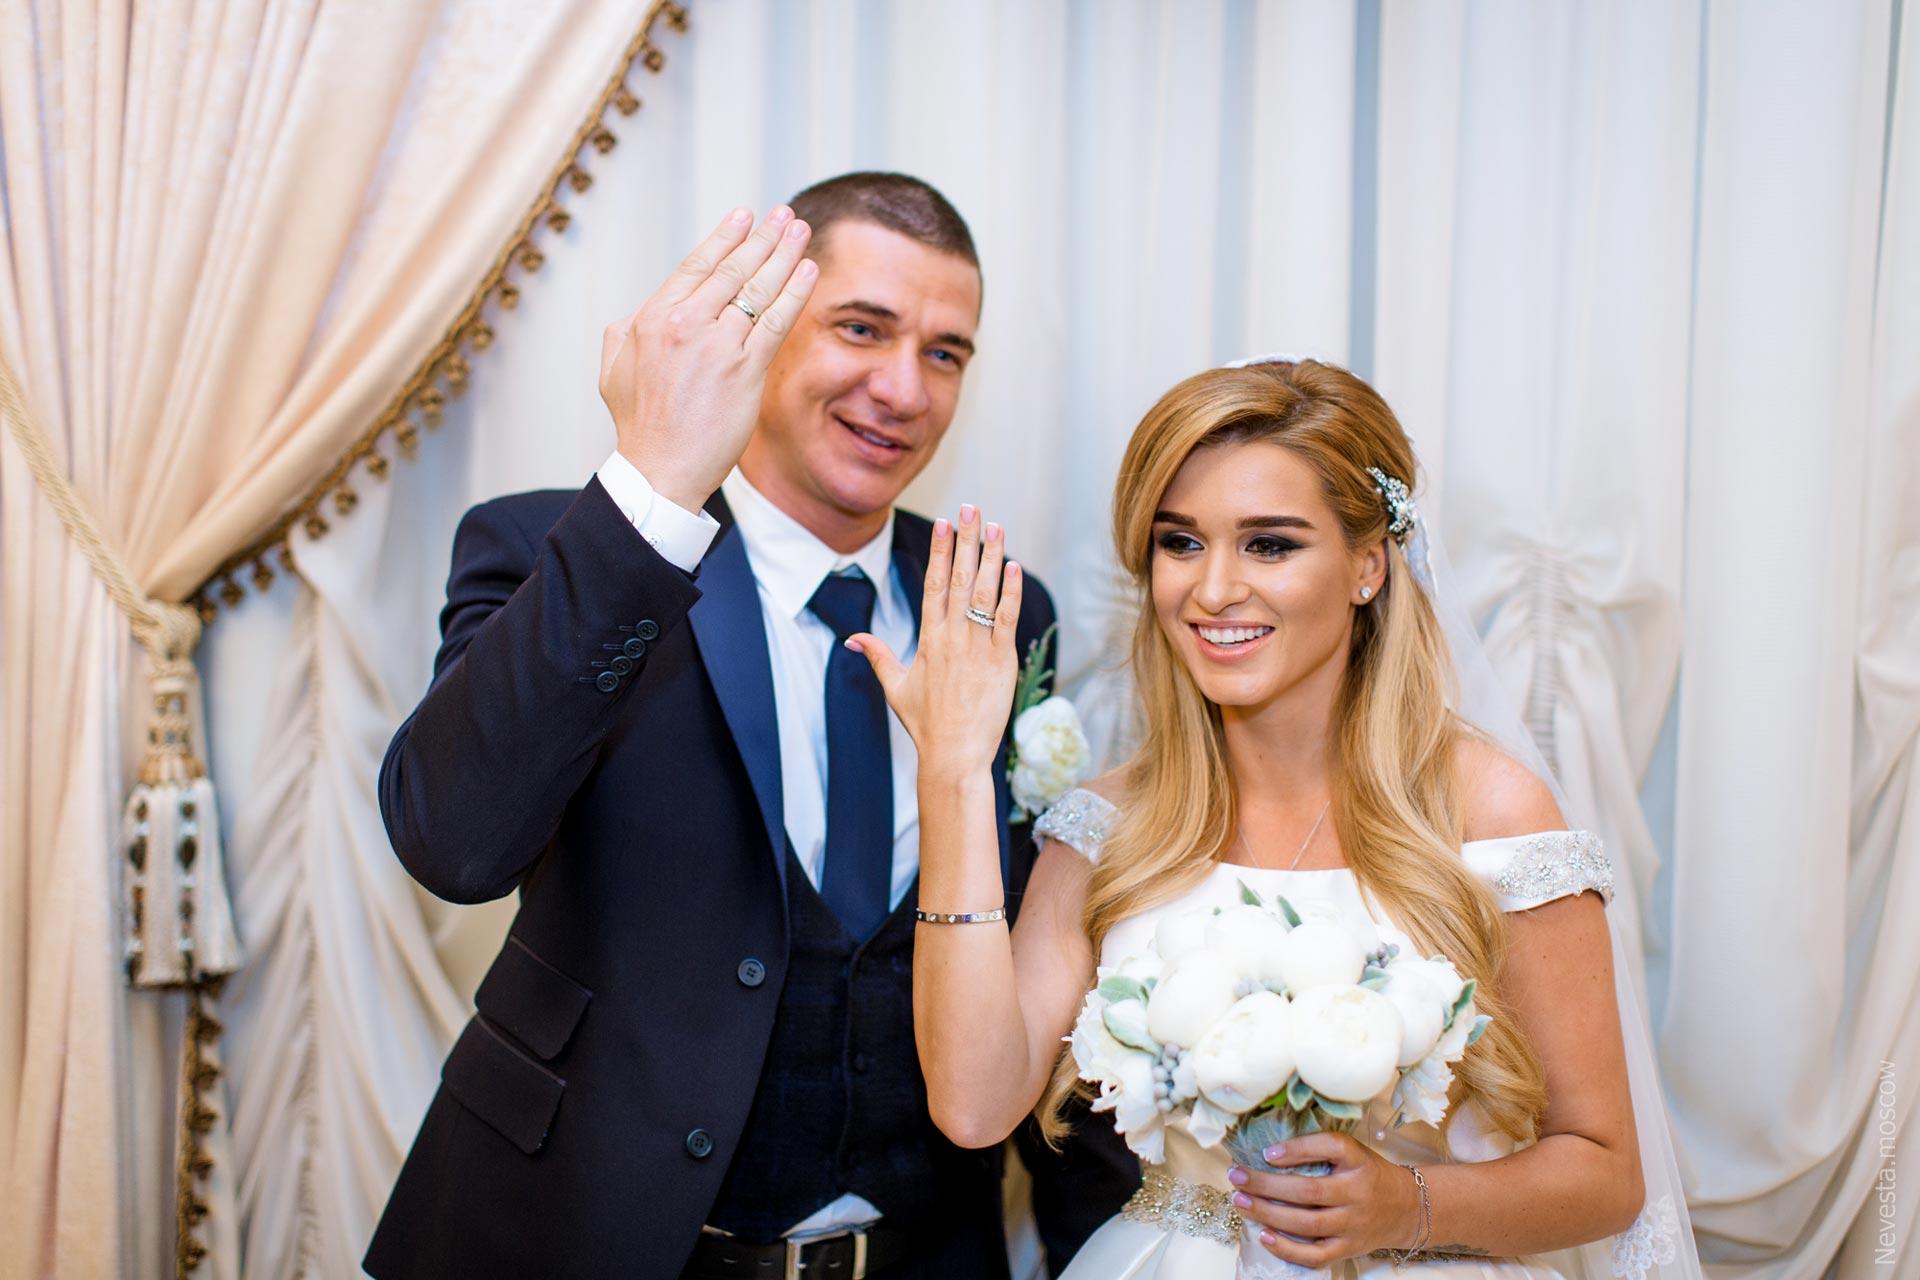 свадьба игоря николаева и юлия проскурякова фото